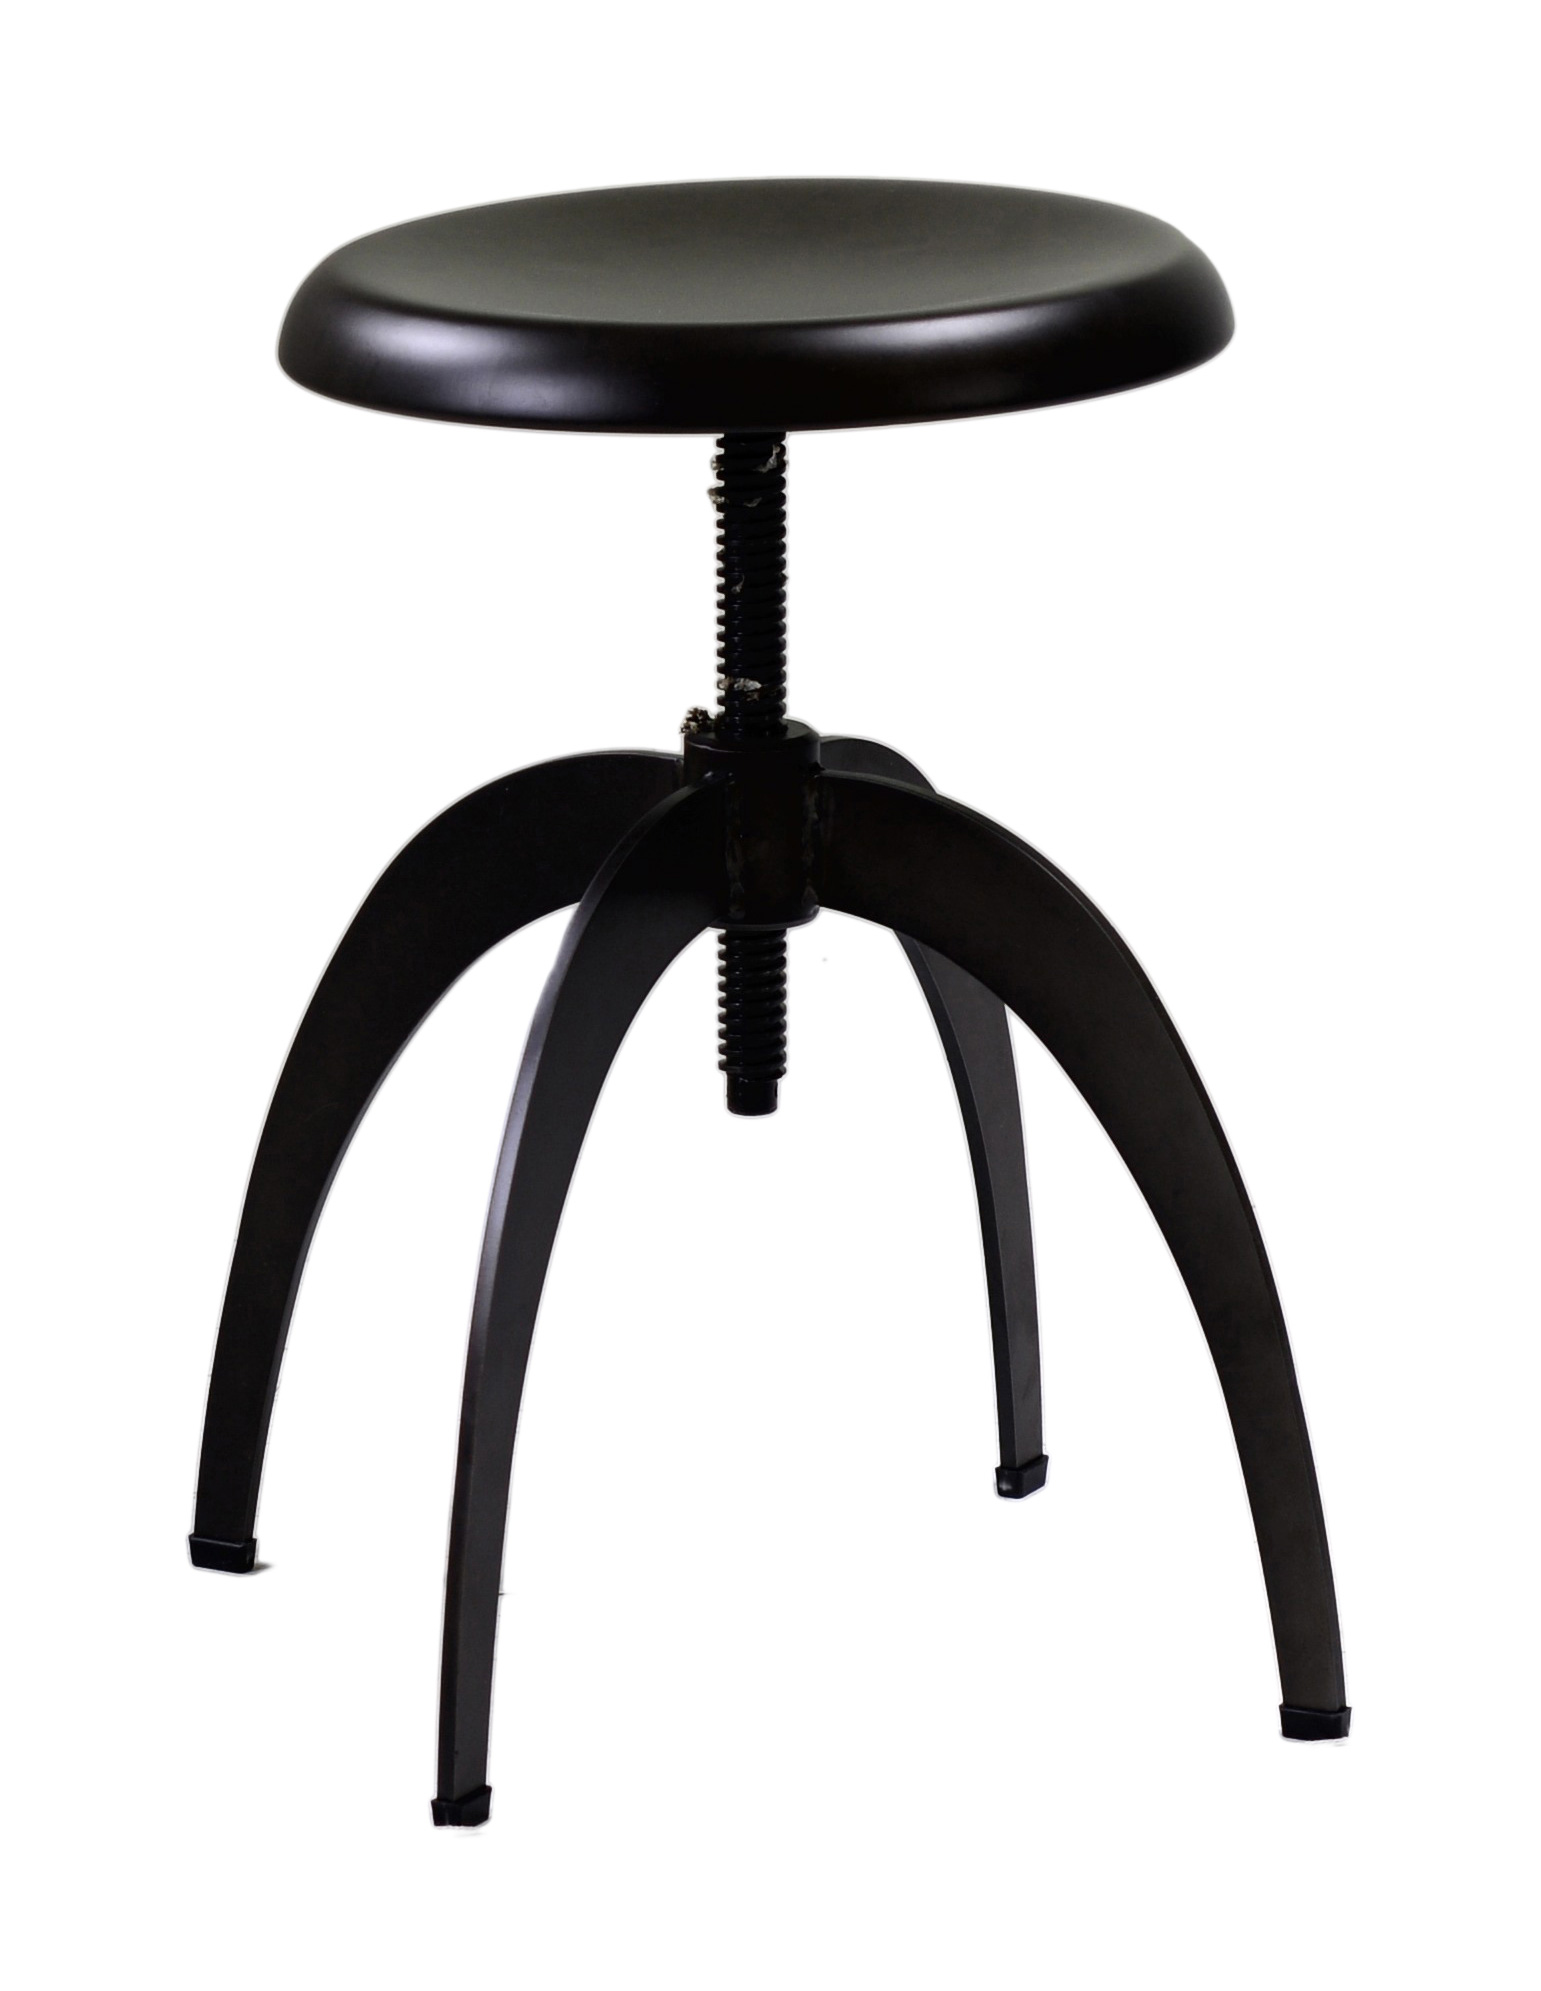 BRISTOL VITE - Franchi Sedie - sedie, sgabelli, ufficio, tavoli ...